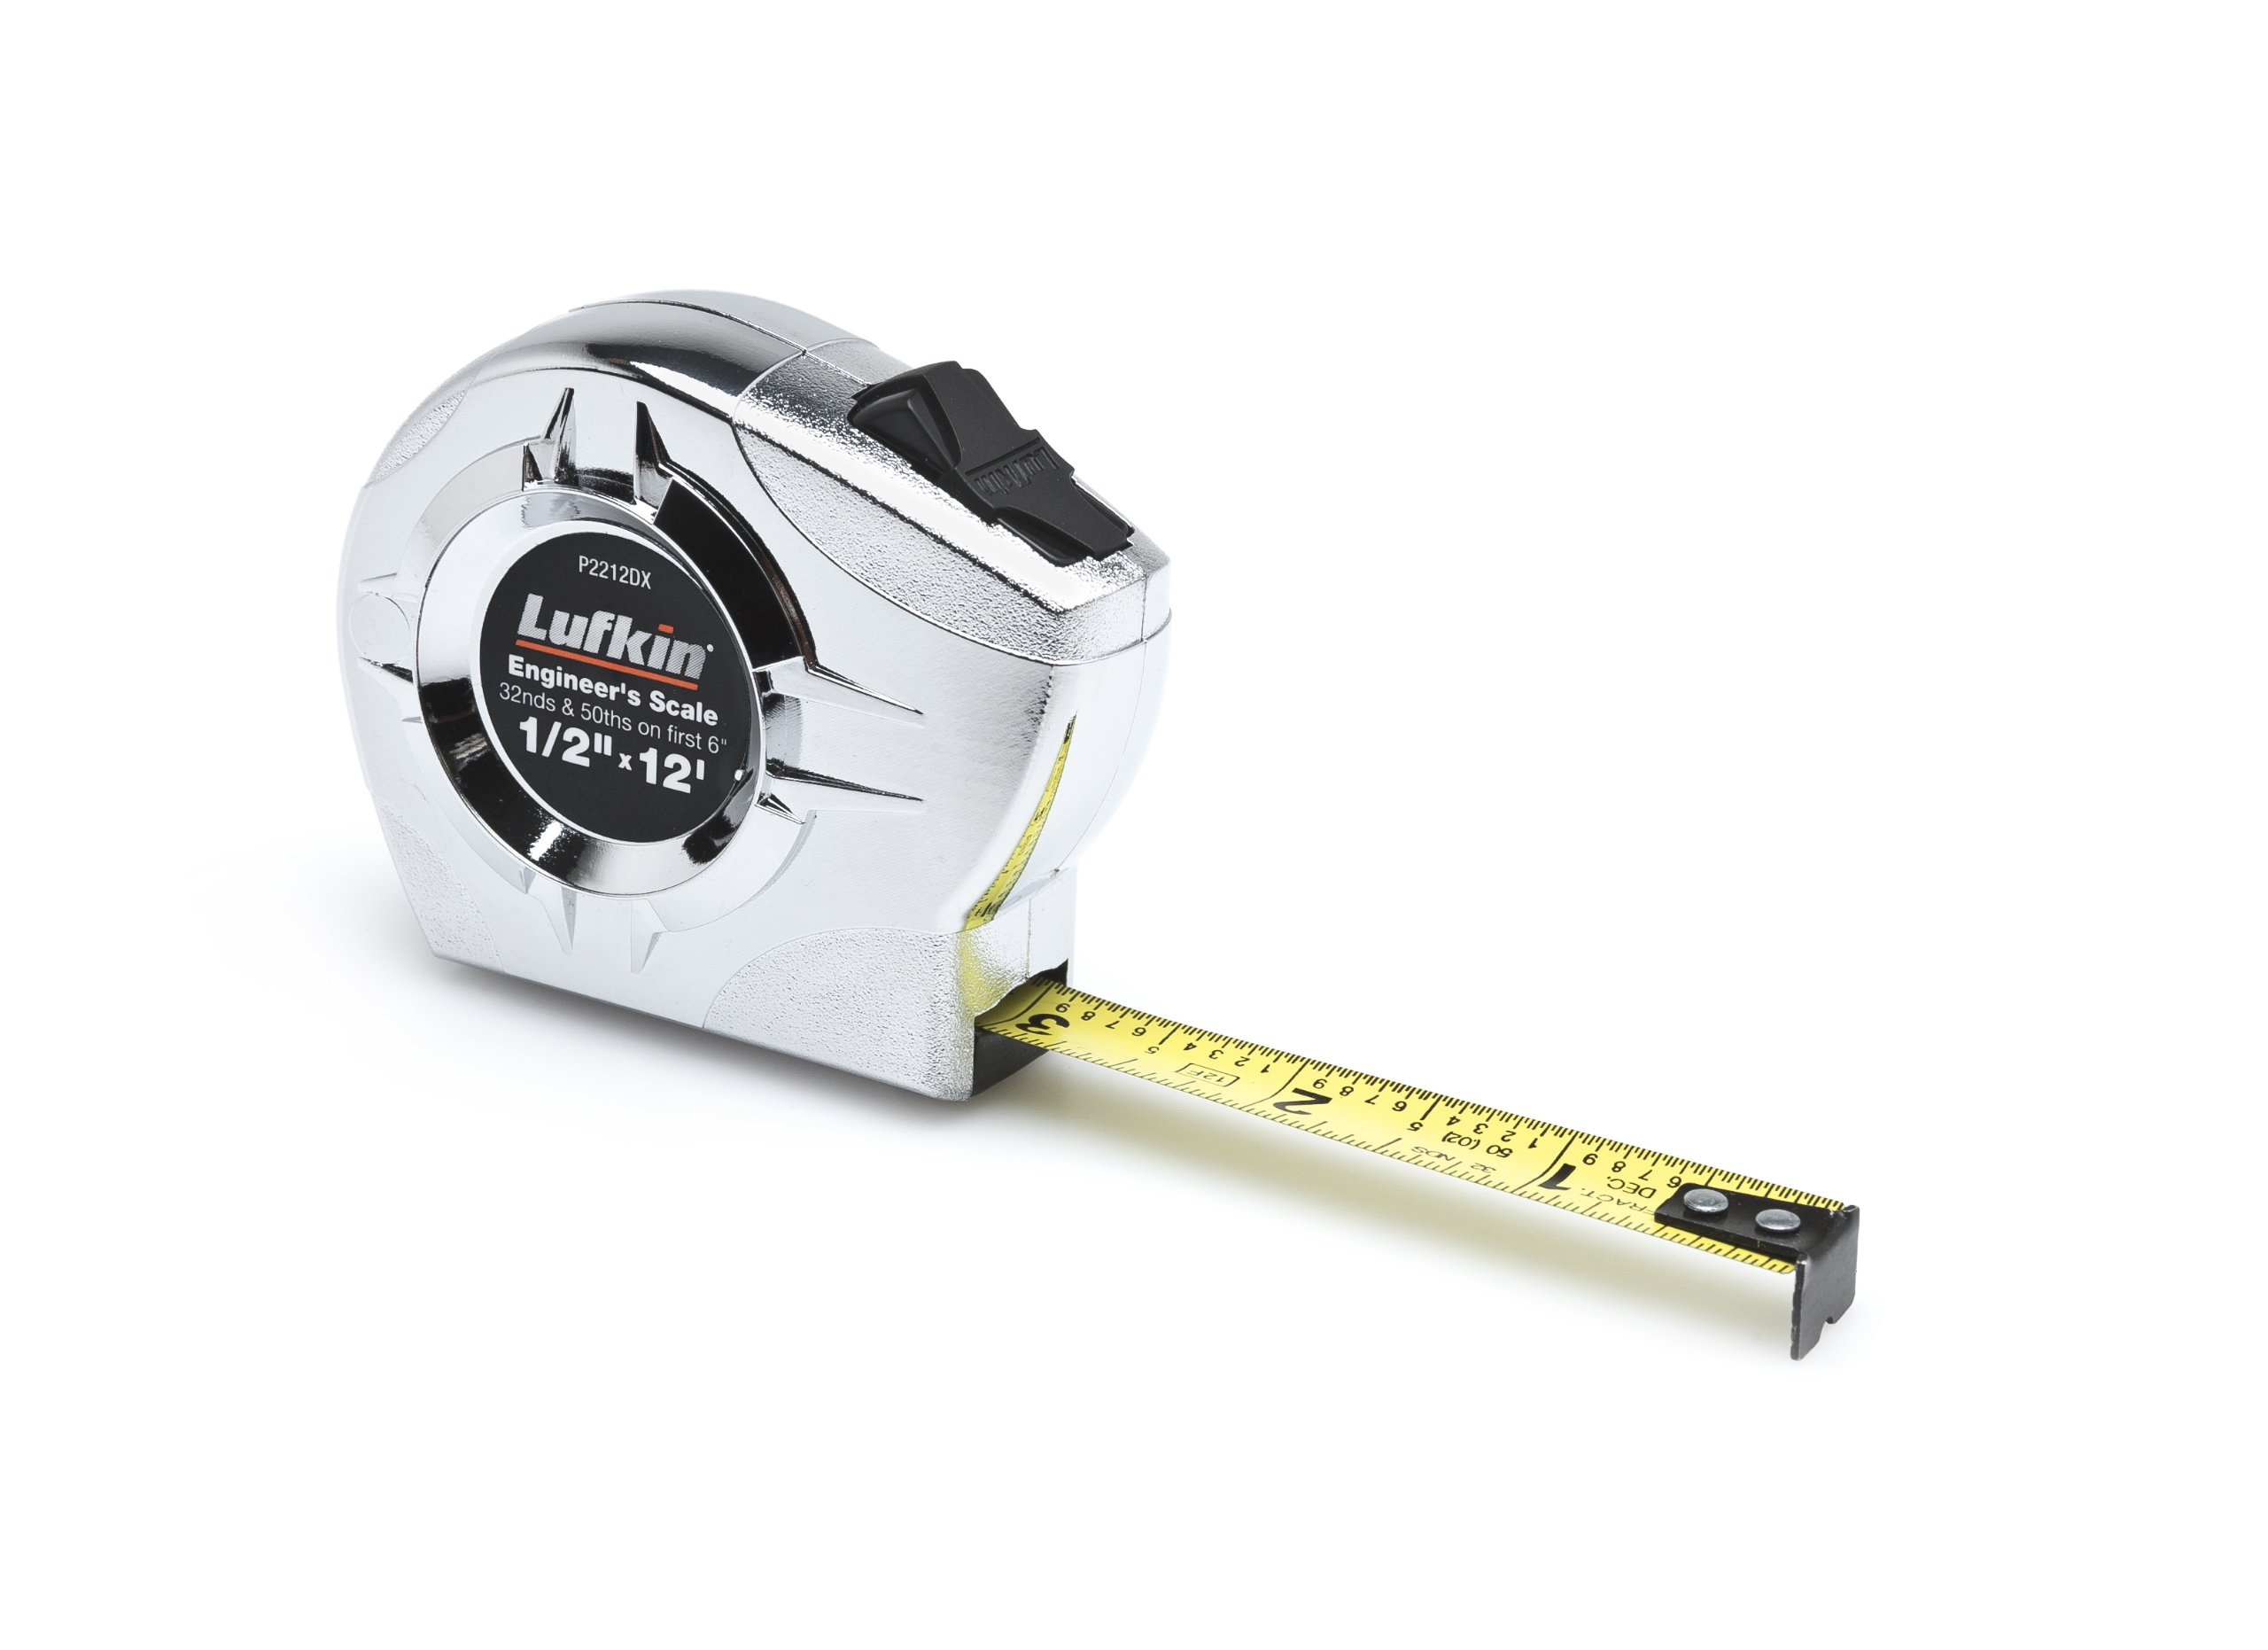 Lufkin P2212DX Power Return Engineer's Tape, 1/2-Inch by 12-Feet, Chrome